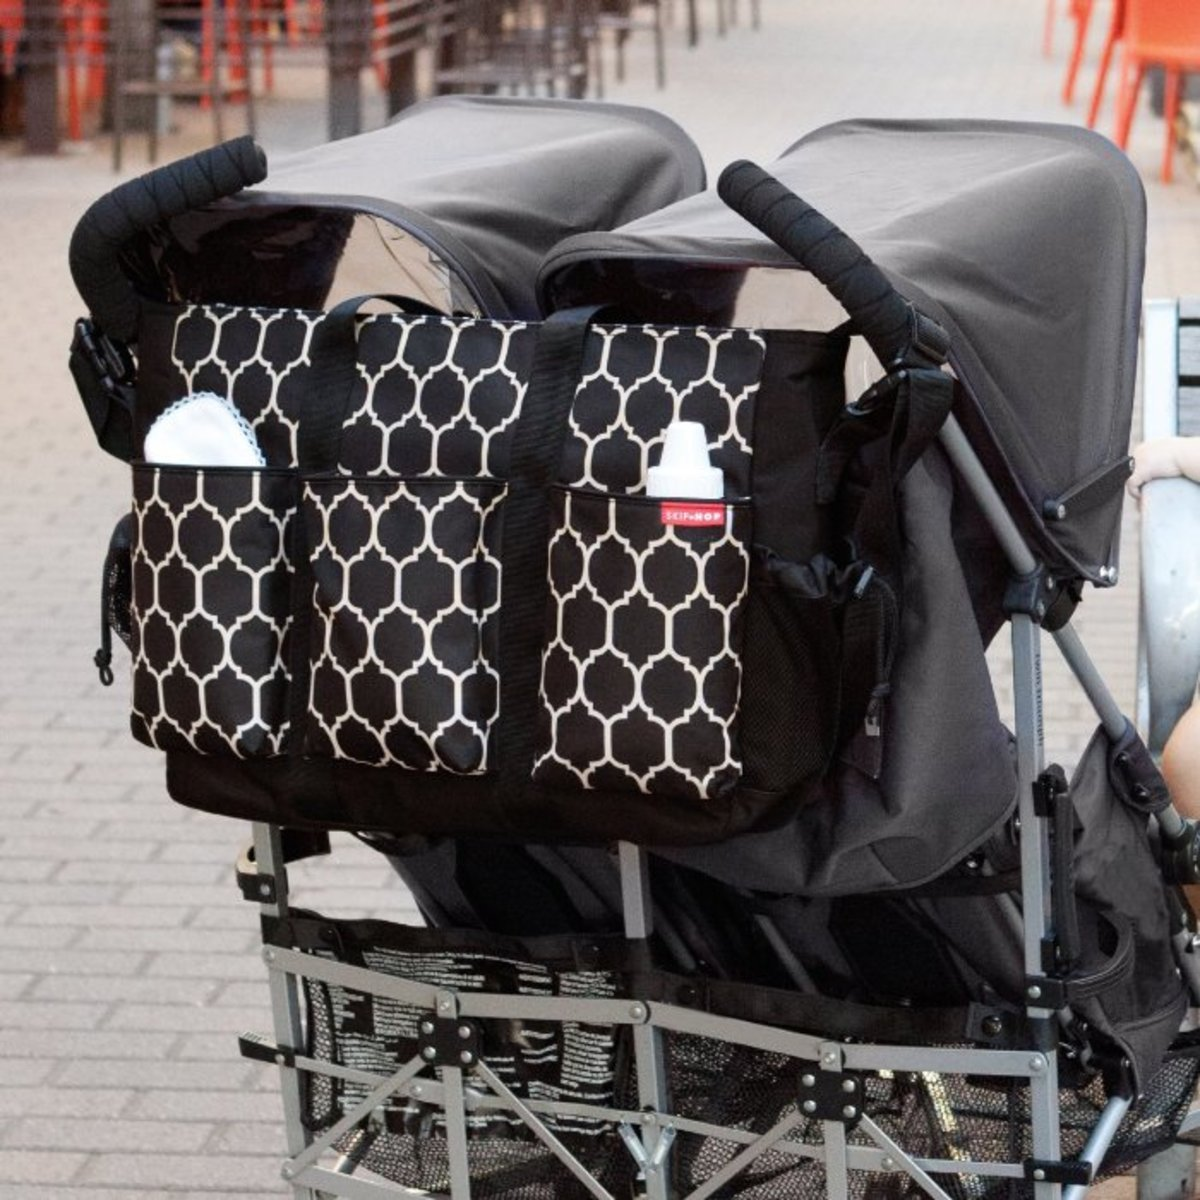 best diaper bags for twins two kids multiple children 2015 reviews. Black Bedroom Furniture Sets. Home Design Ideas